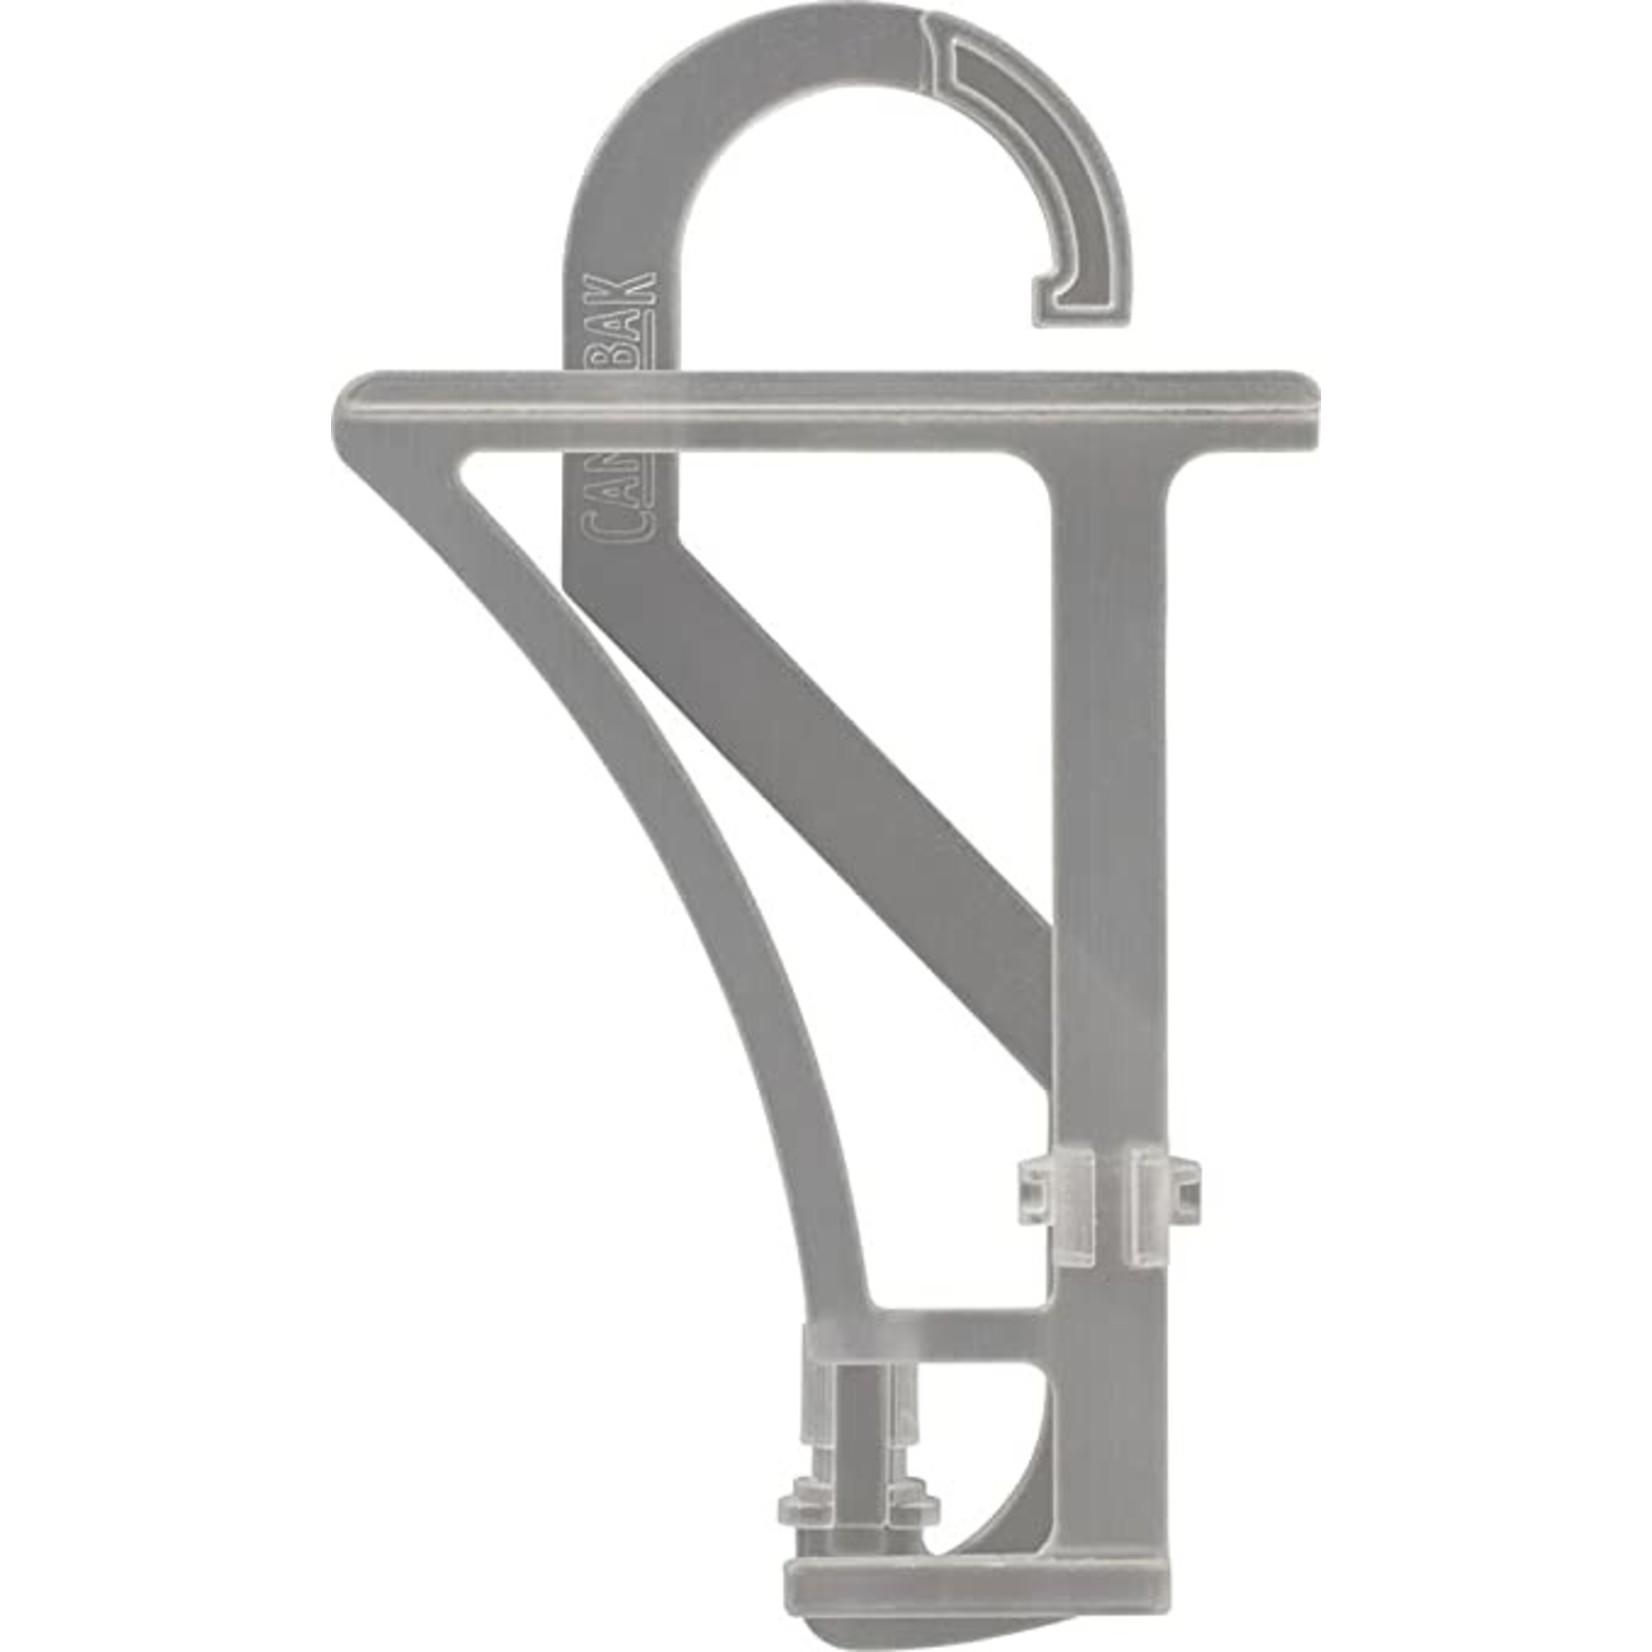 CAMELBAK Hydration Accessories - Resevoir Dryer